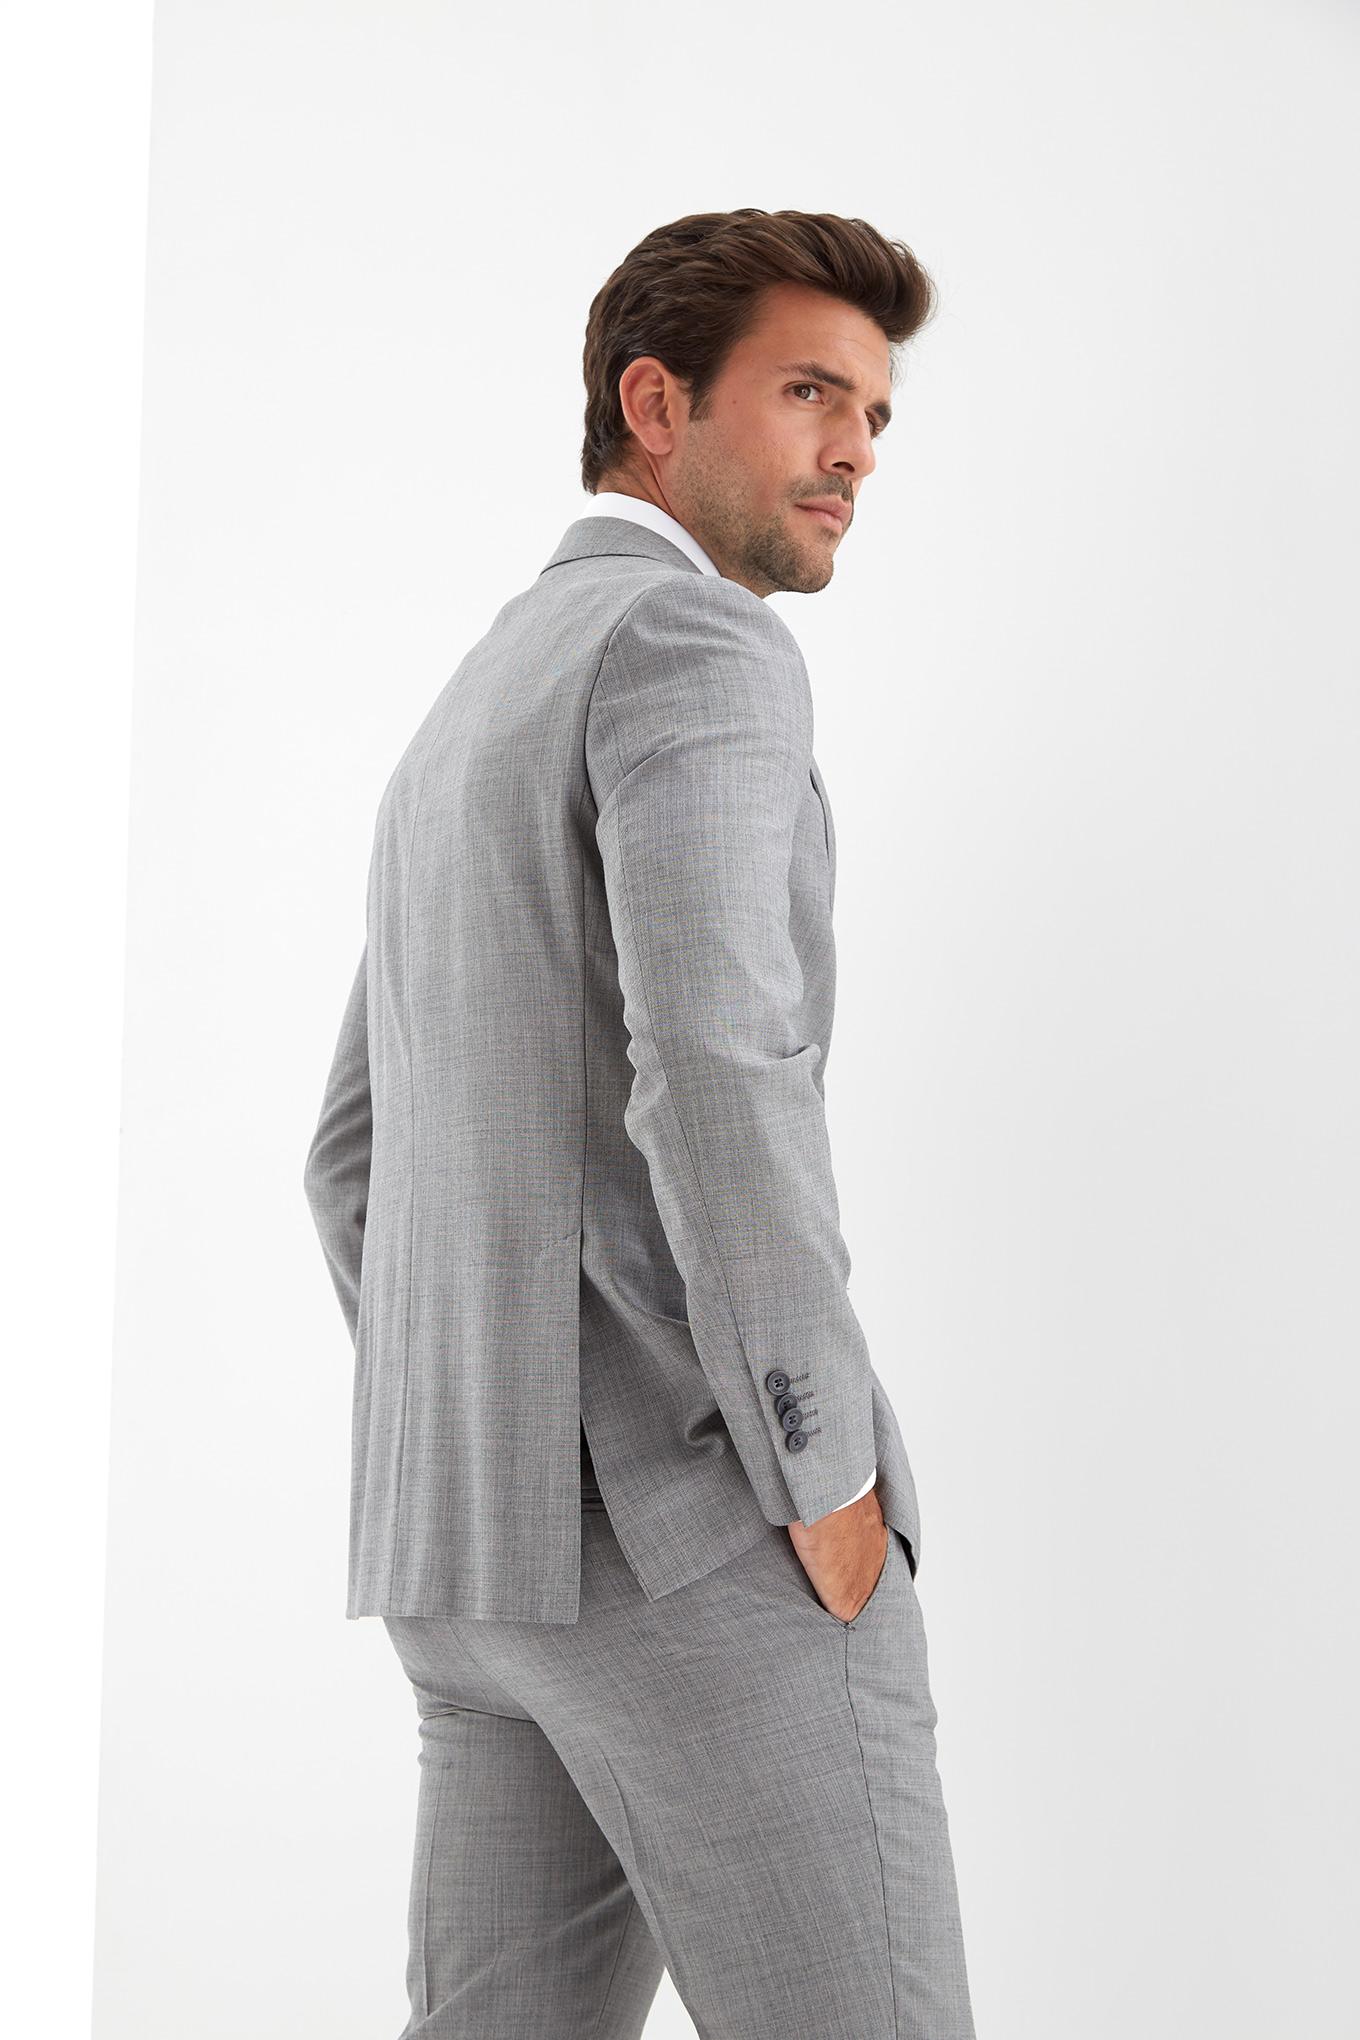 Suit Light Grey Classic Man